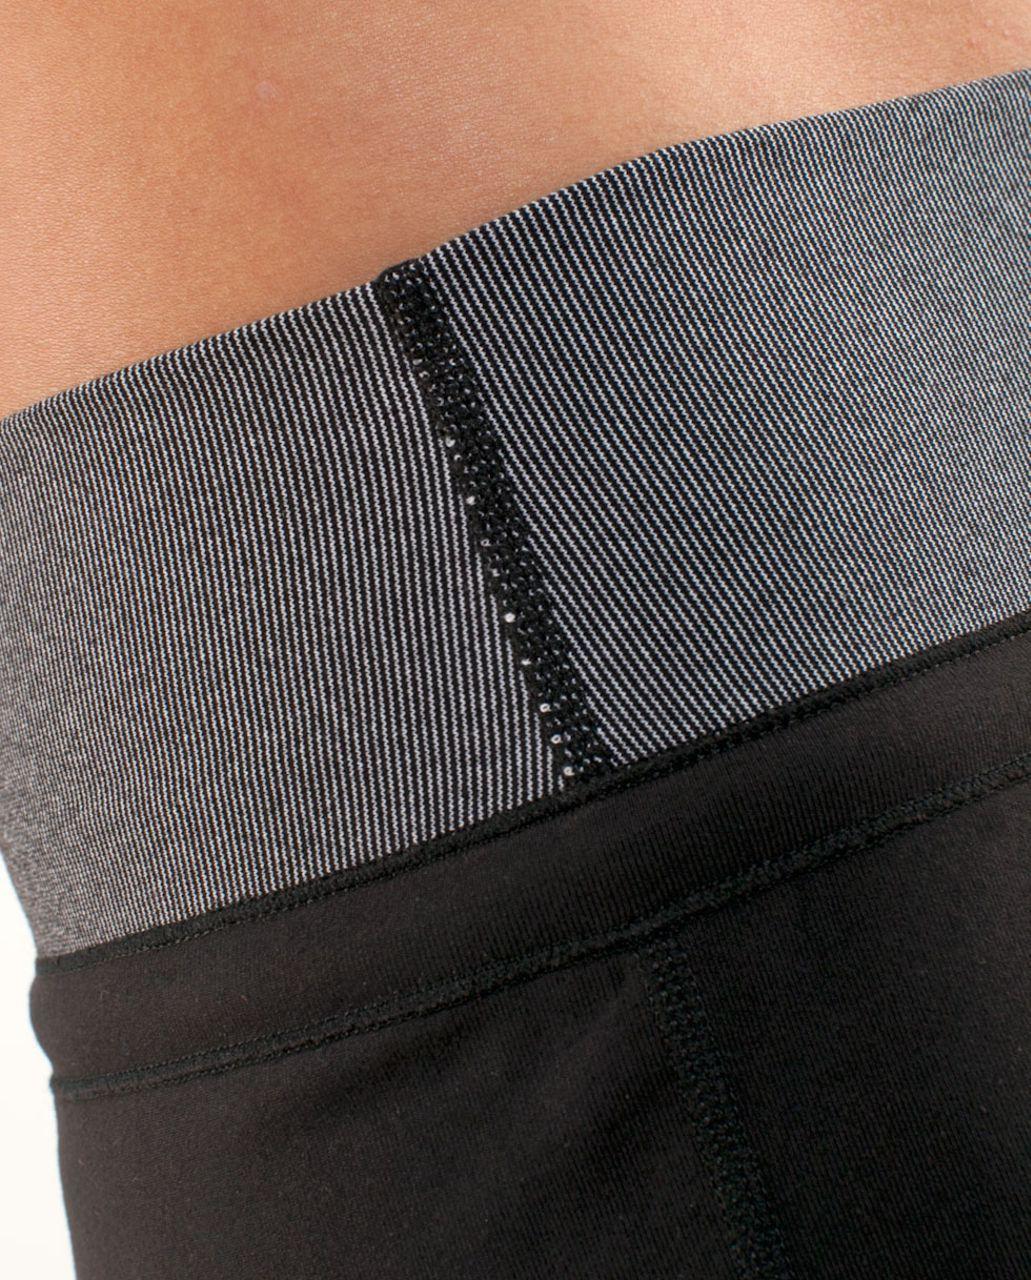 Lululemon Knock Out Short - Black /  Black Microstripe